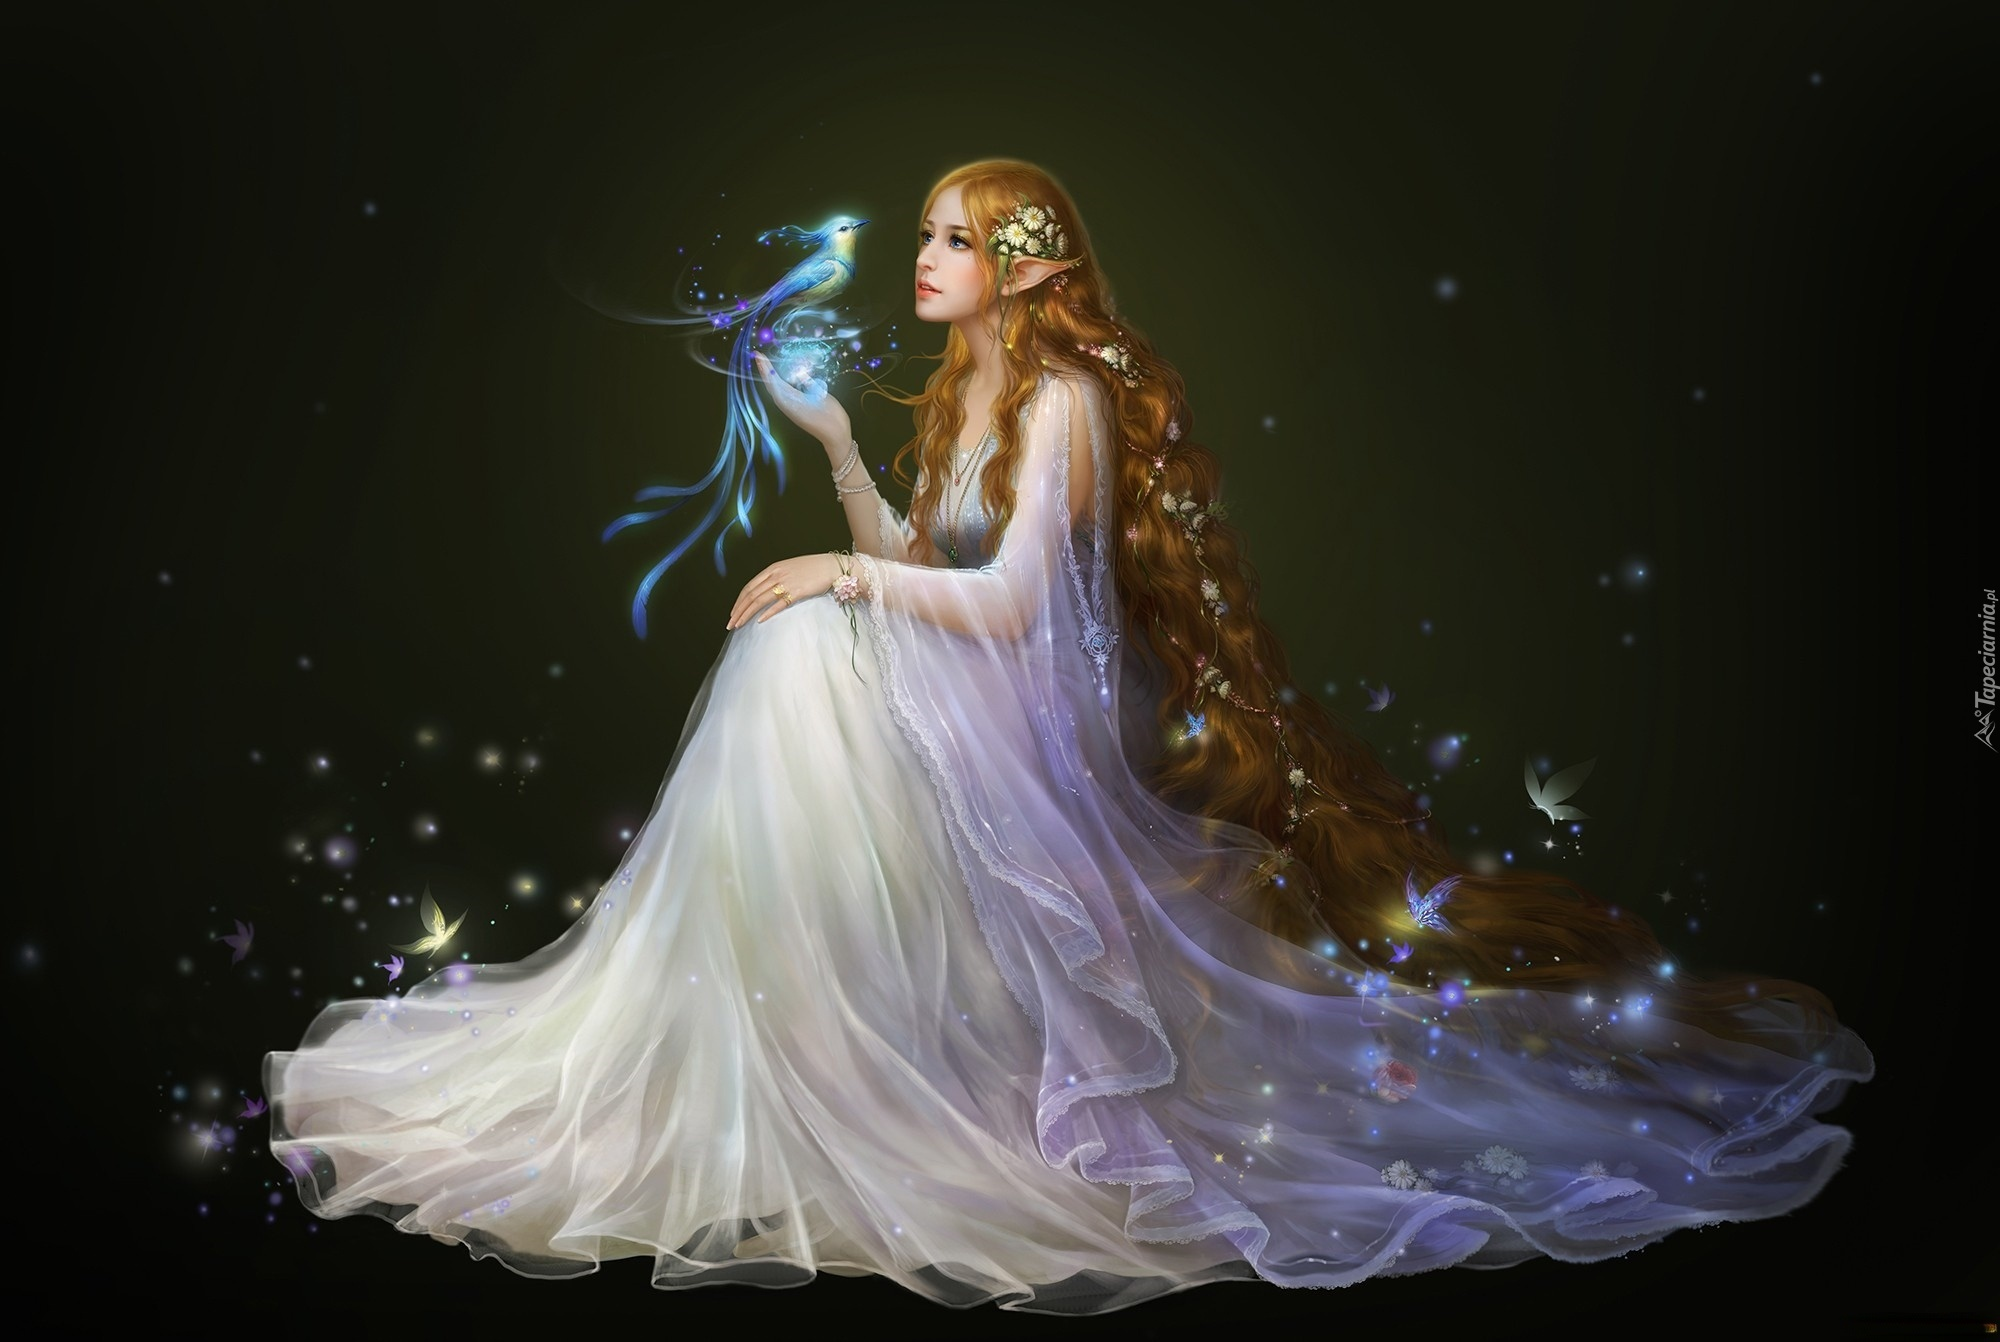 Fairy картинки 6